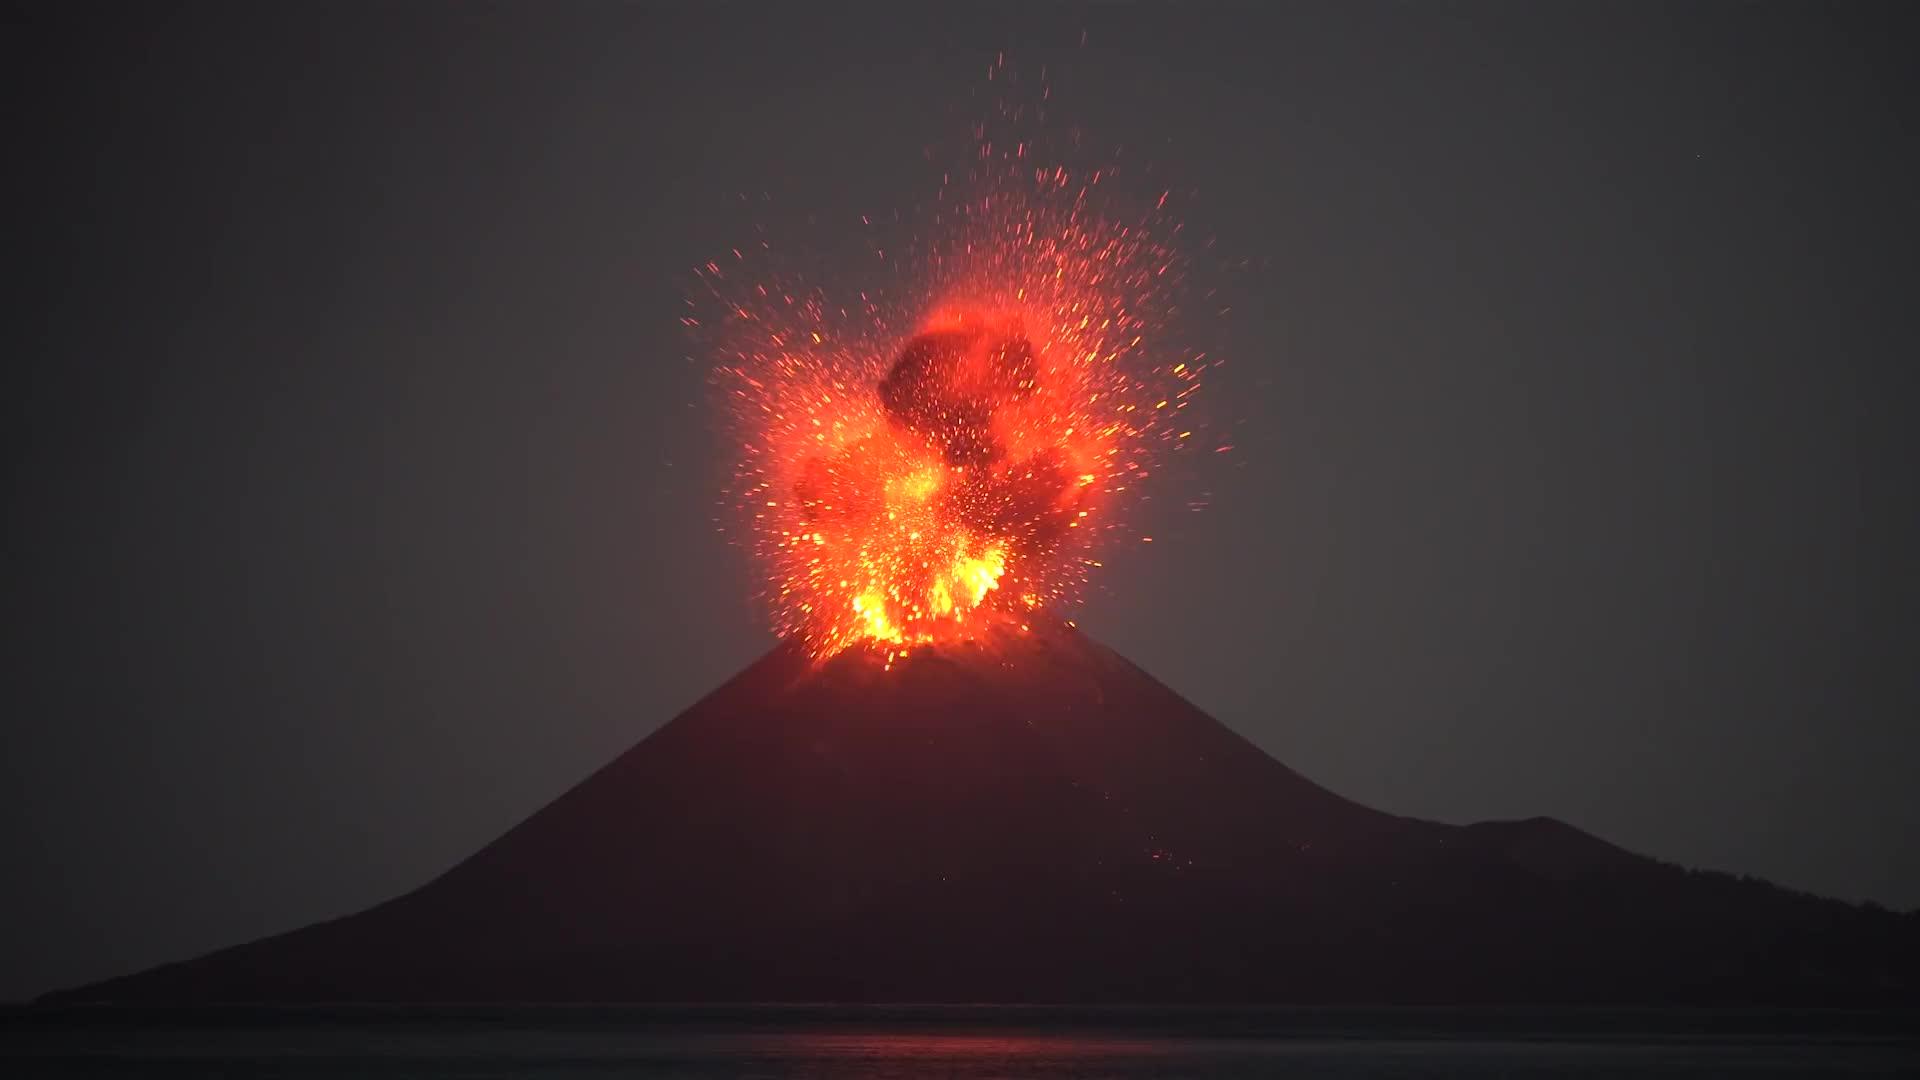 krakatoa gifs search search share on homdor